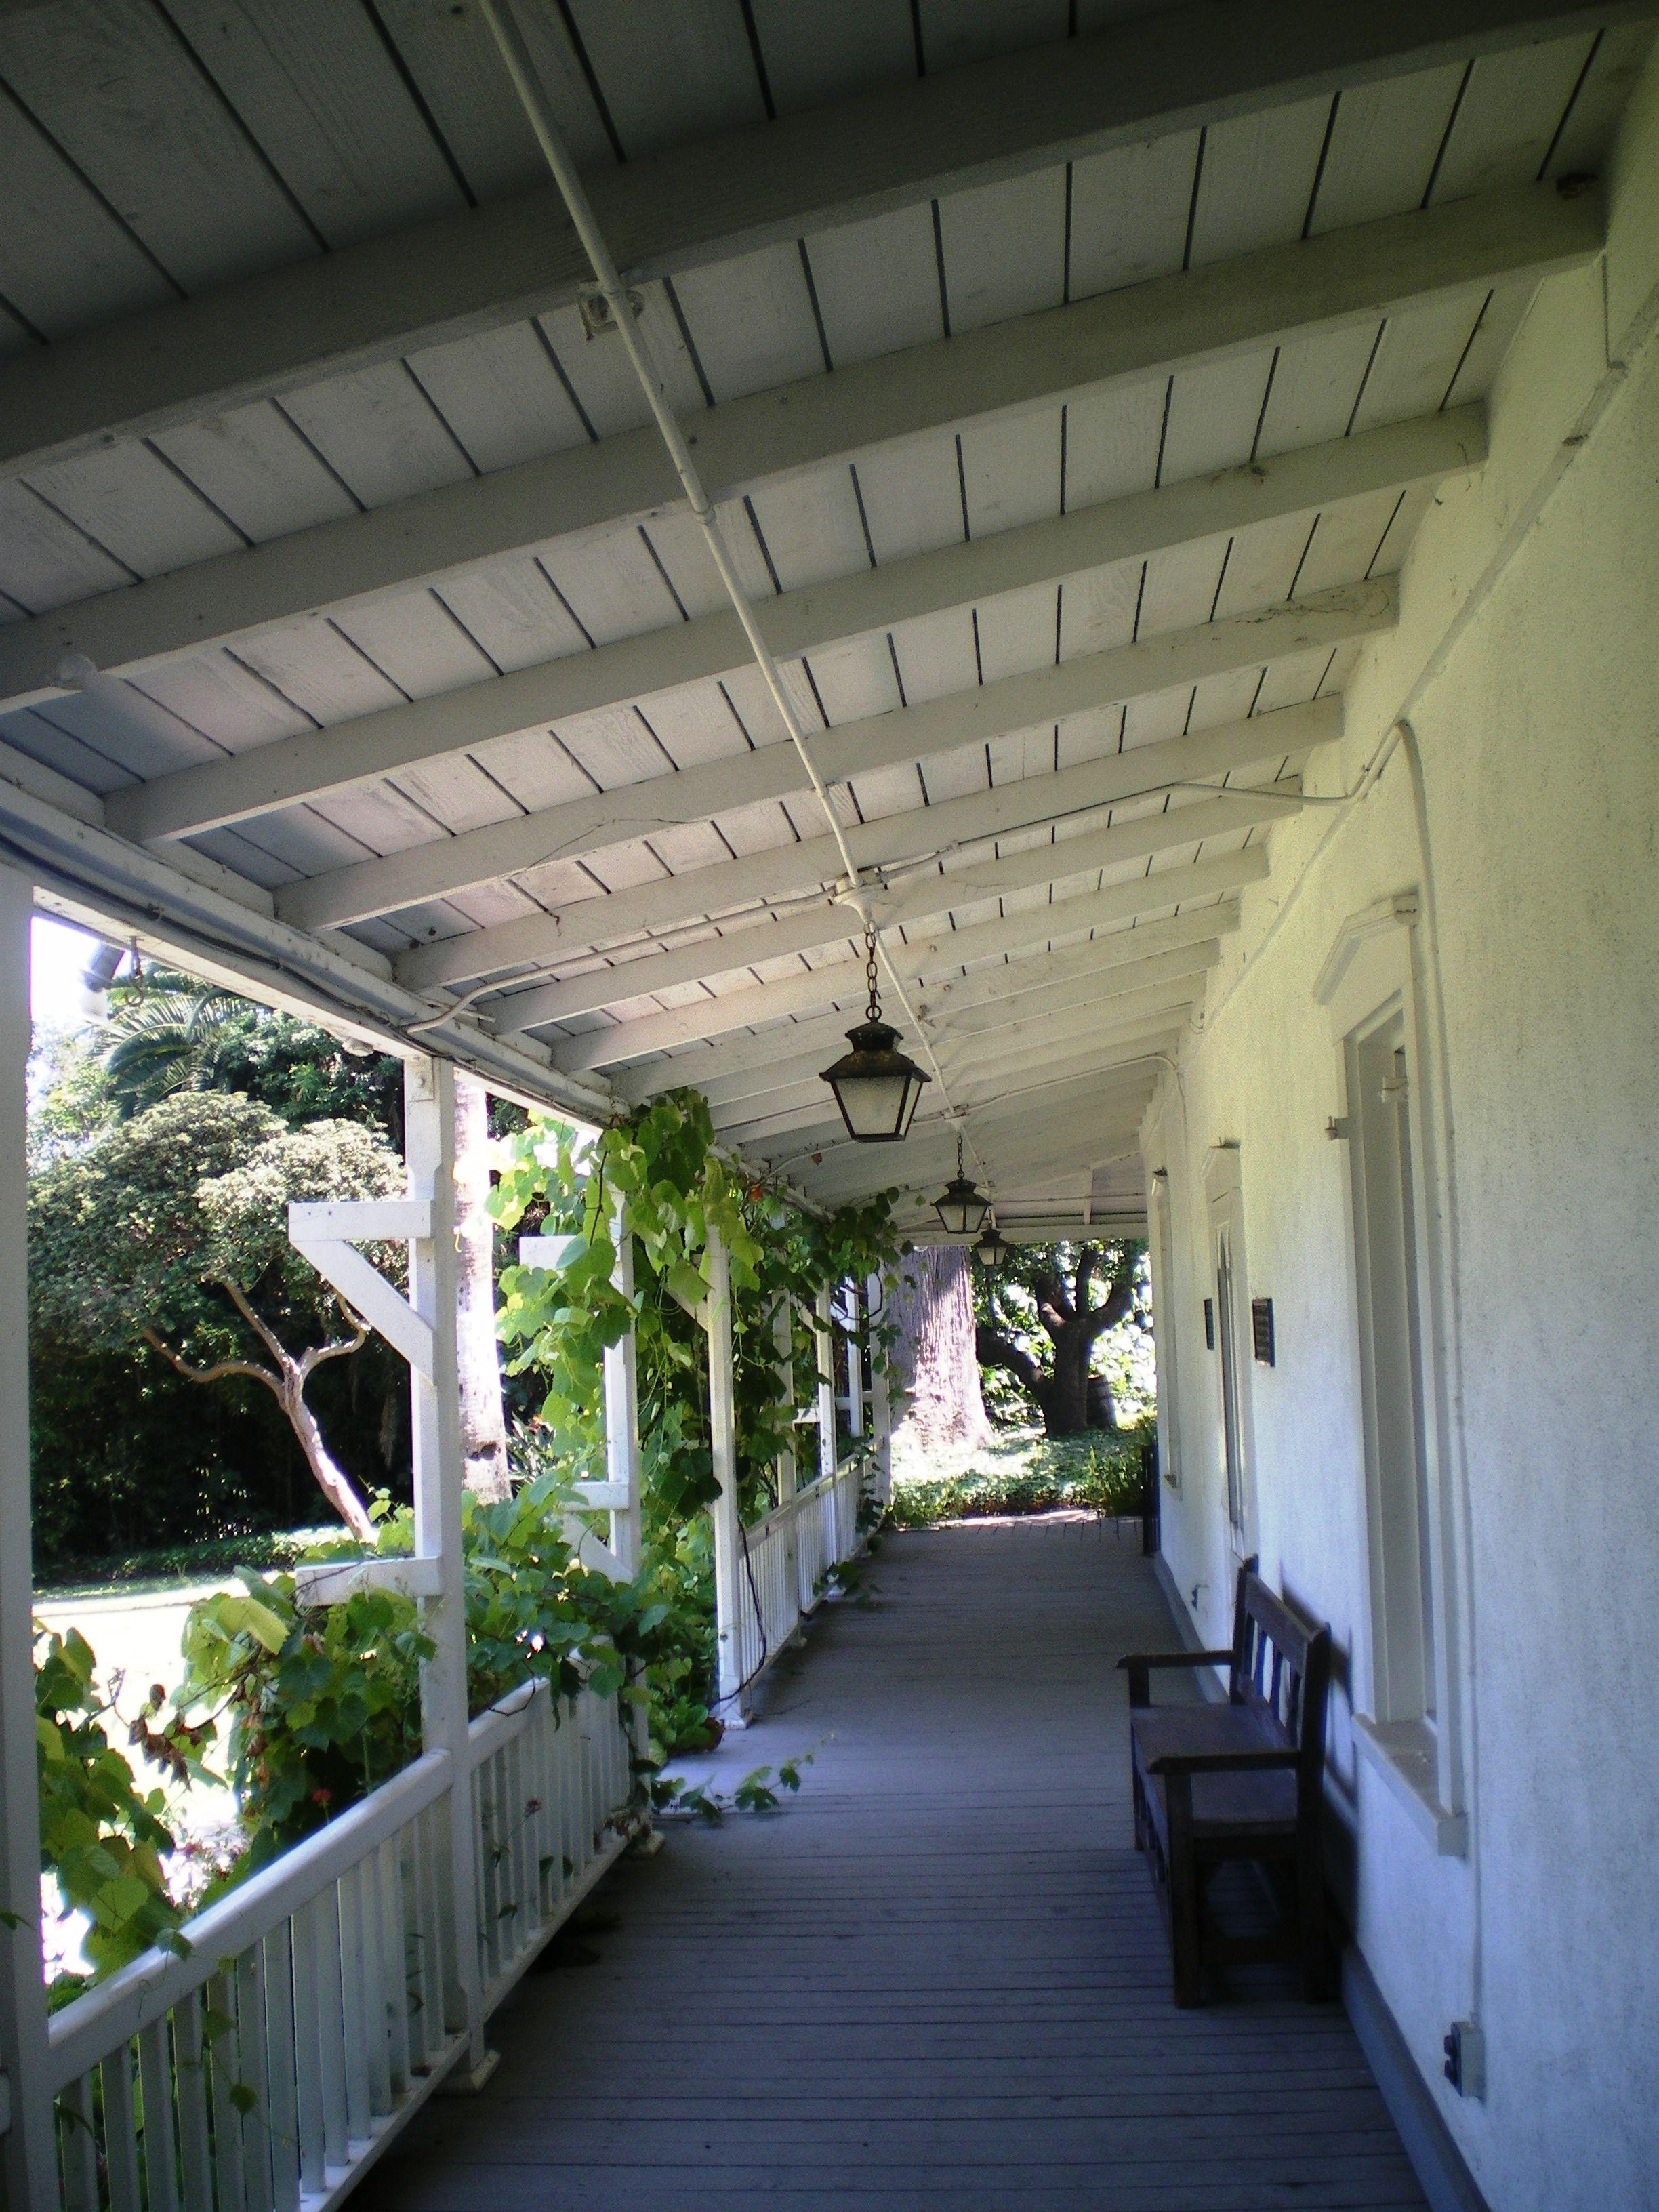 File:Centinela Adobe, Front Porch.JPG - Wikimedia Commons